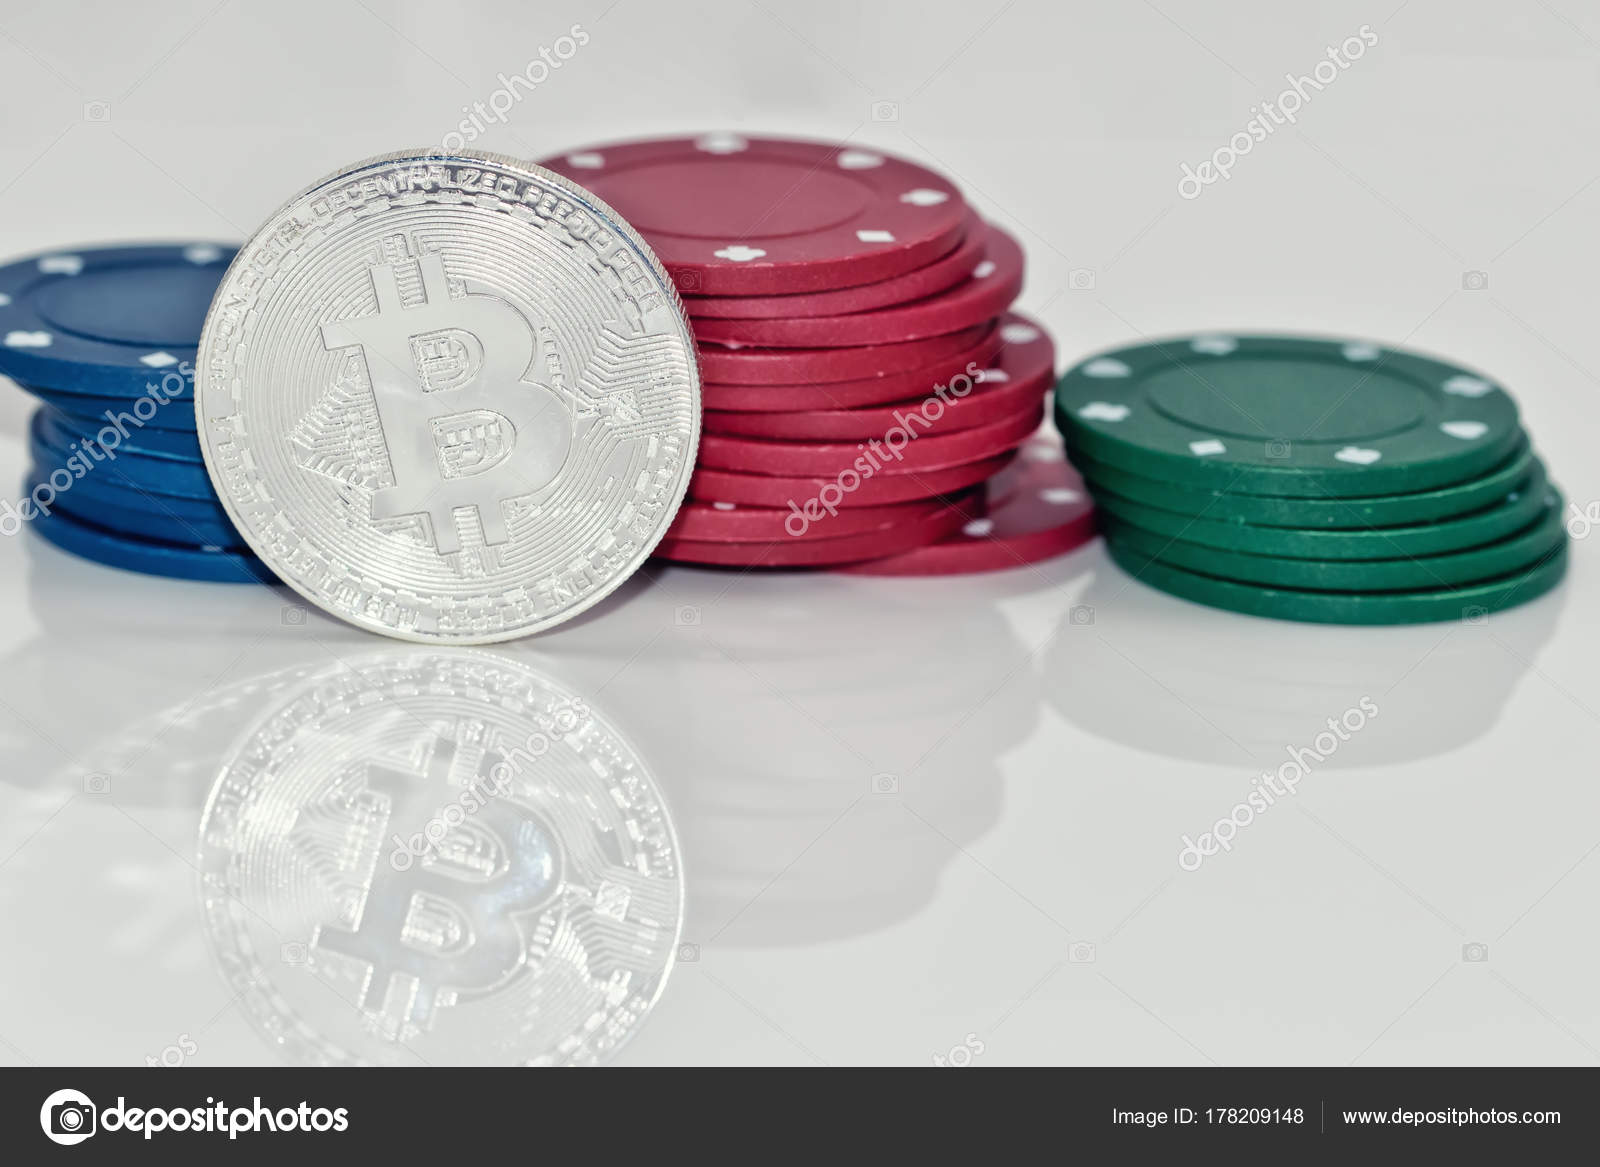 shinobi coin cryptocurrency